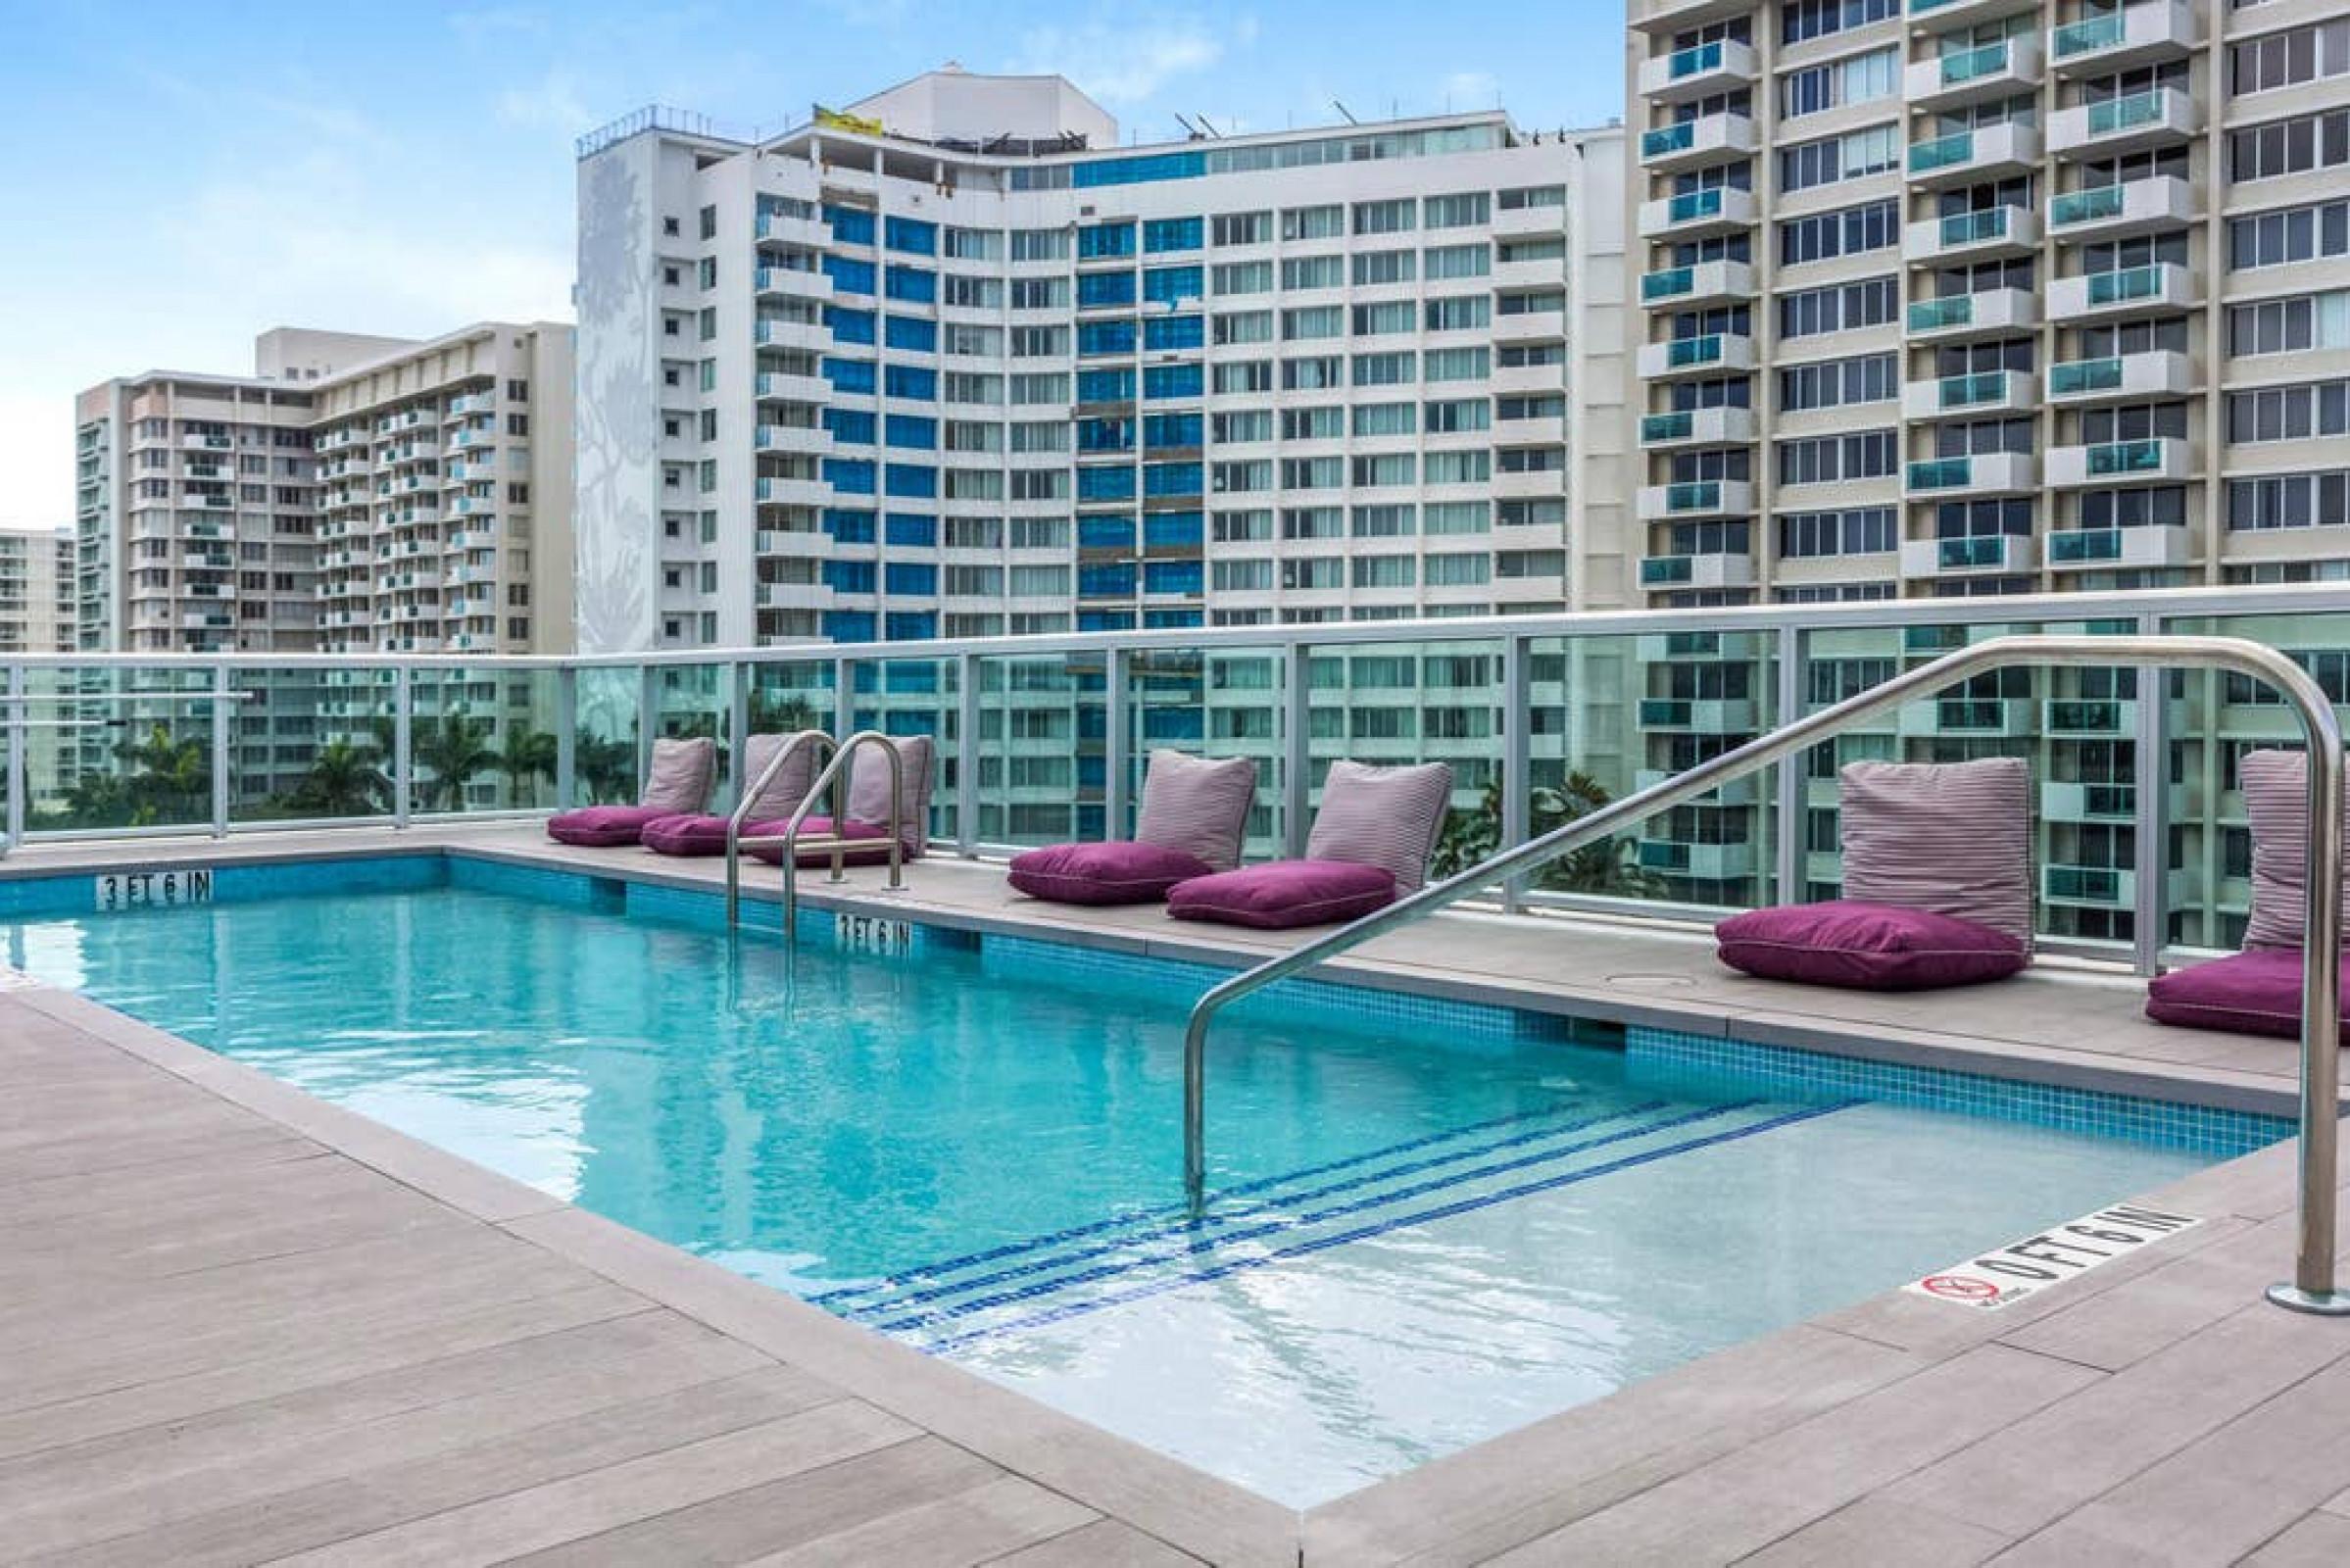 1215 West 56 APT  W/Balcony, Roof Pool & Terrace